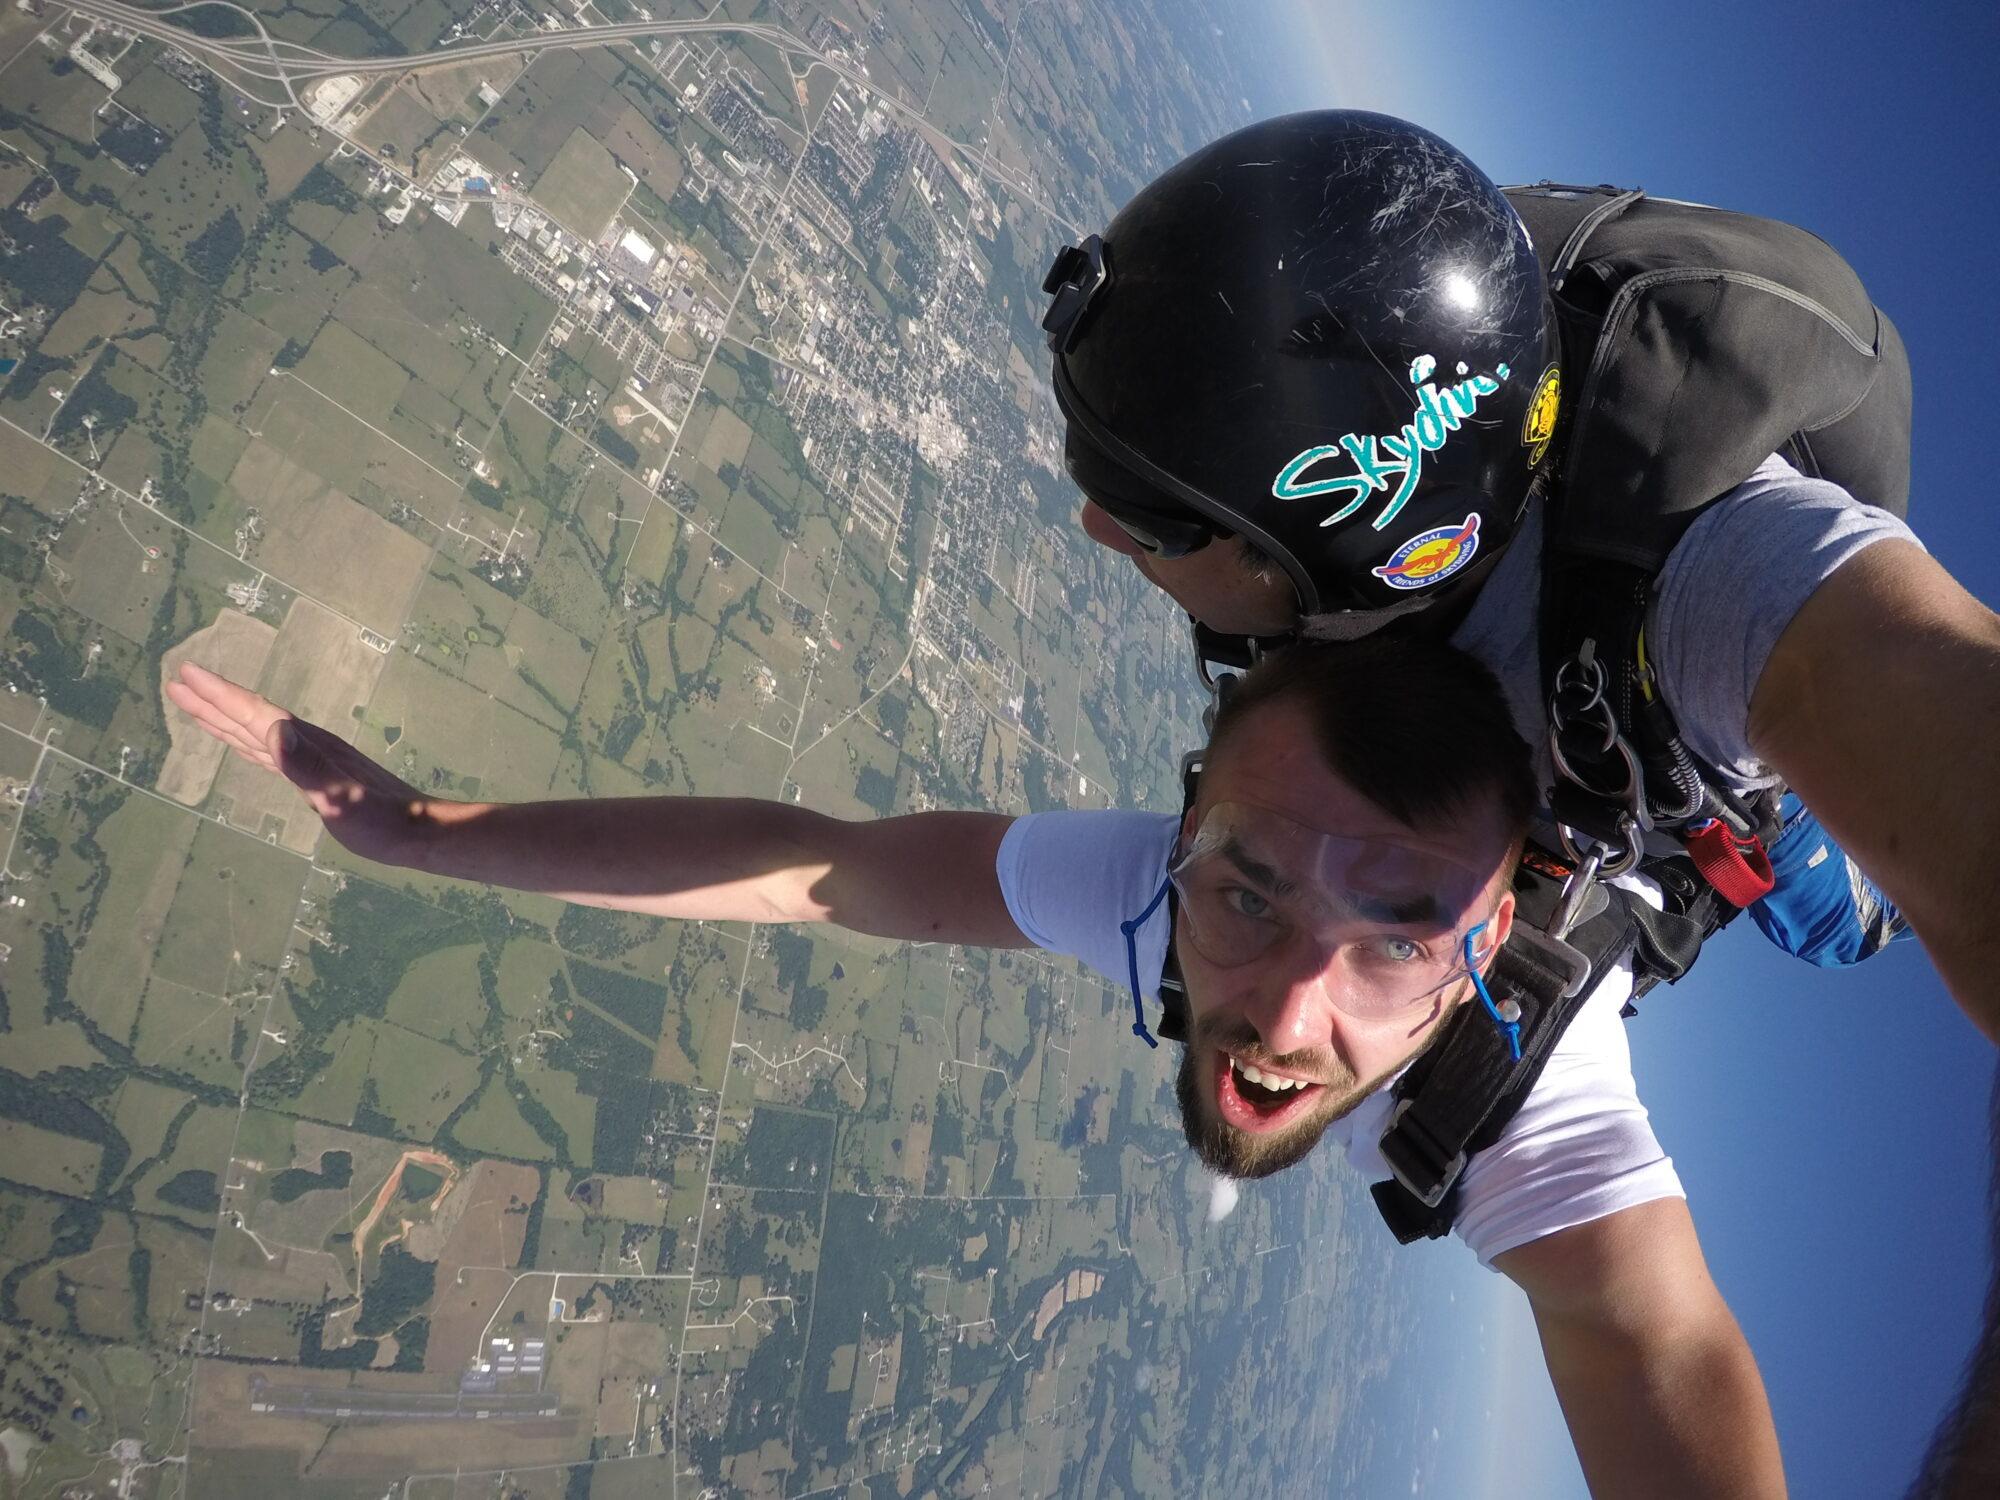 Skydive Springfield 417-SKYDIVE